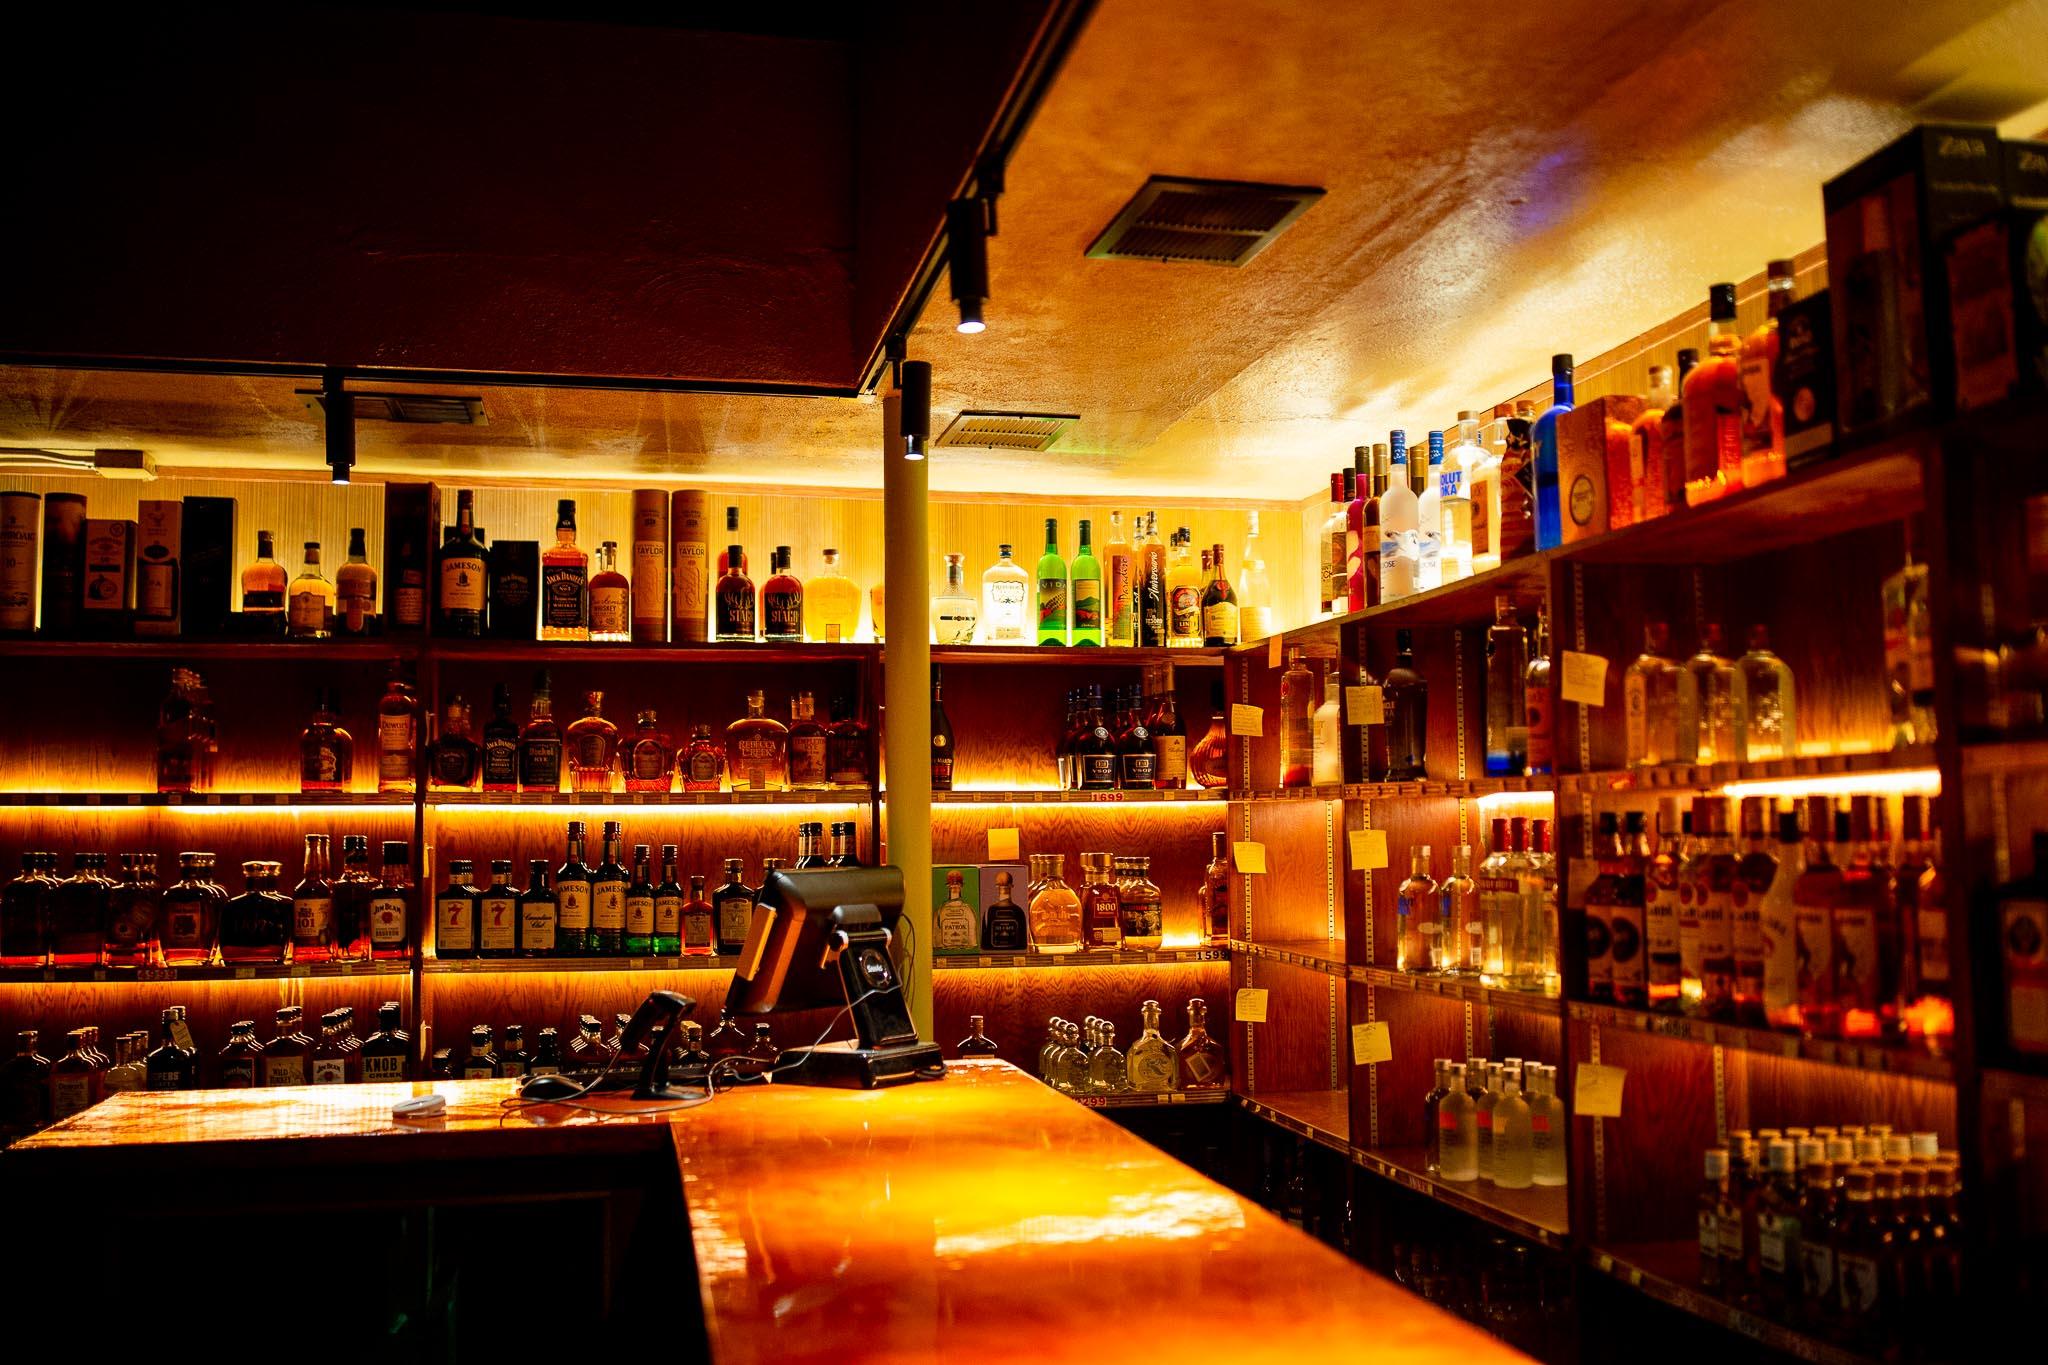 Wallys-Liquor-Store.jpg